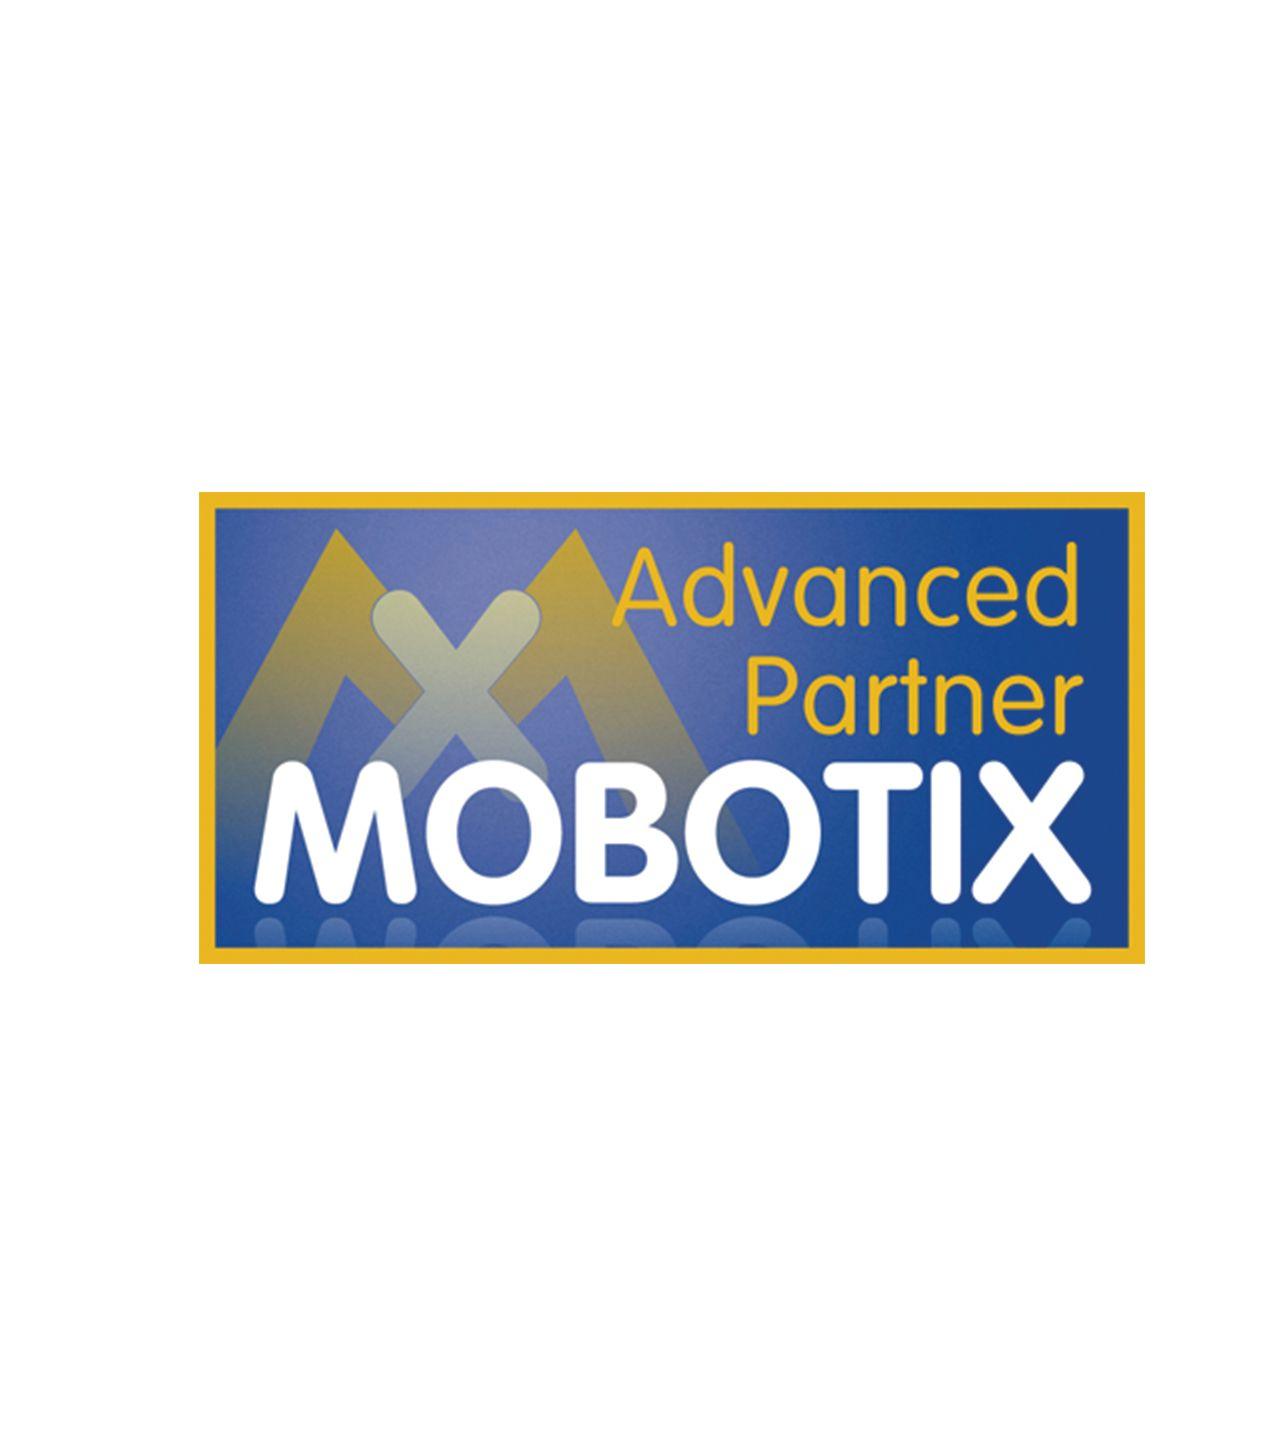 Mobotix T25 intercom - Innocam